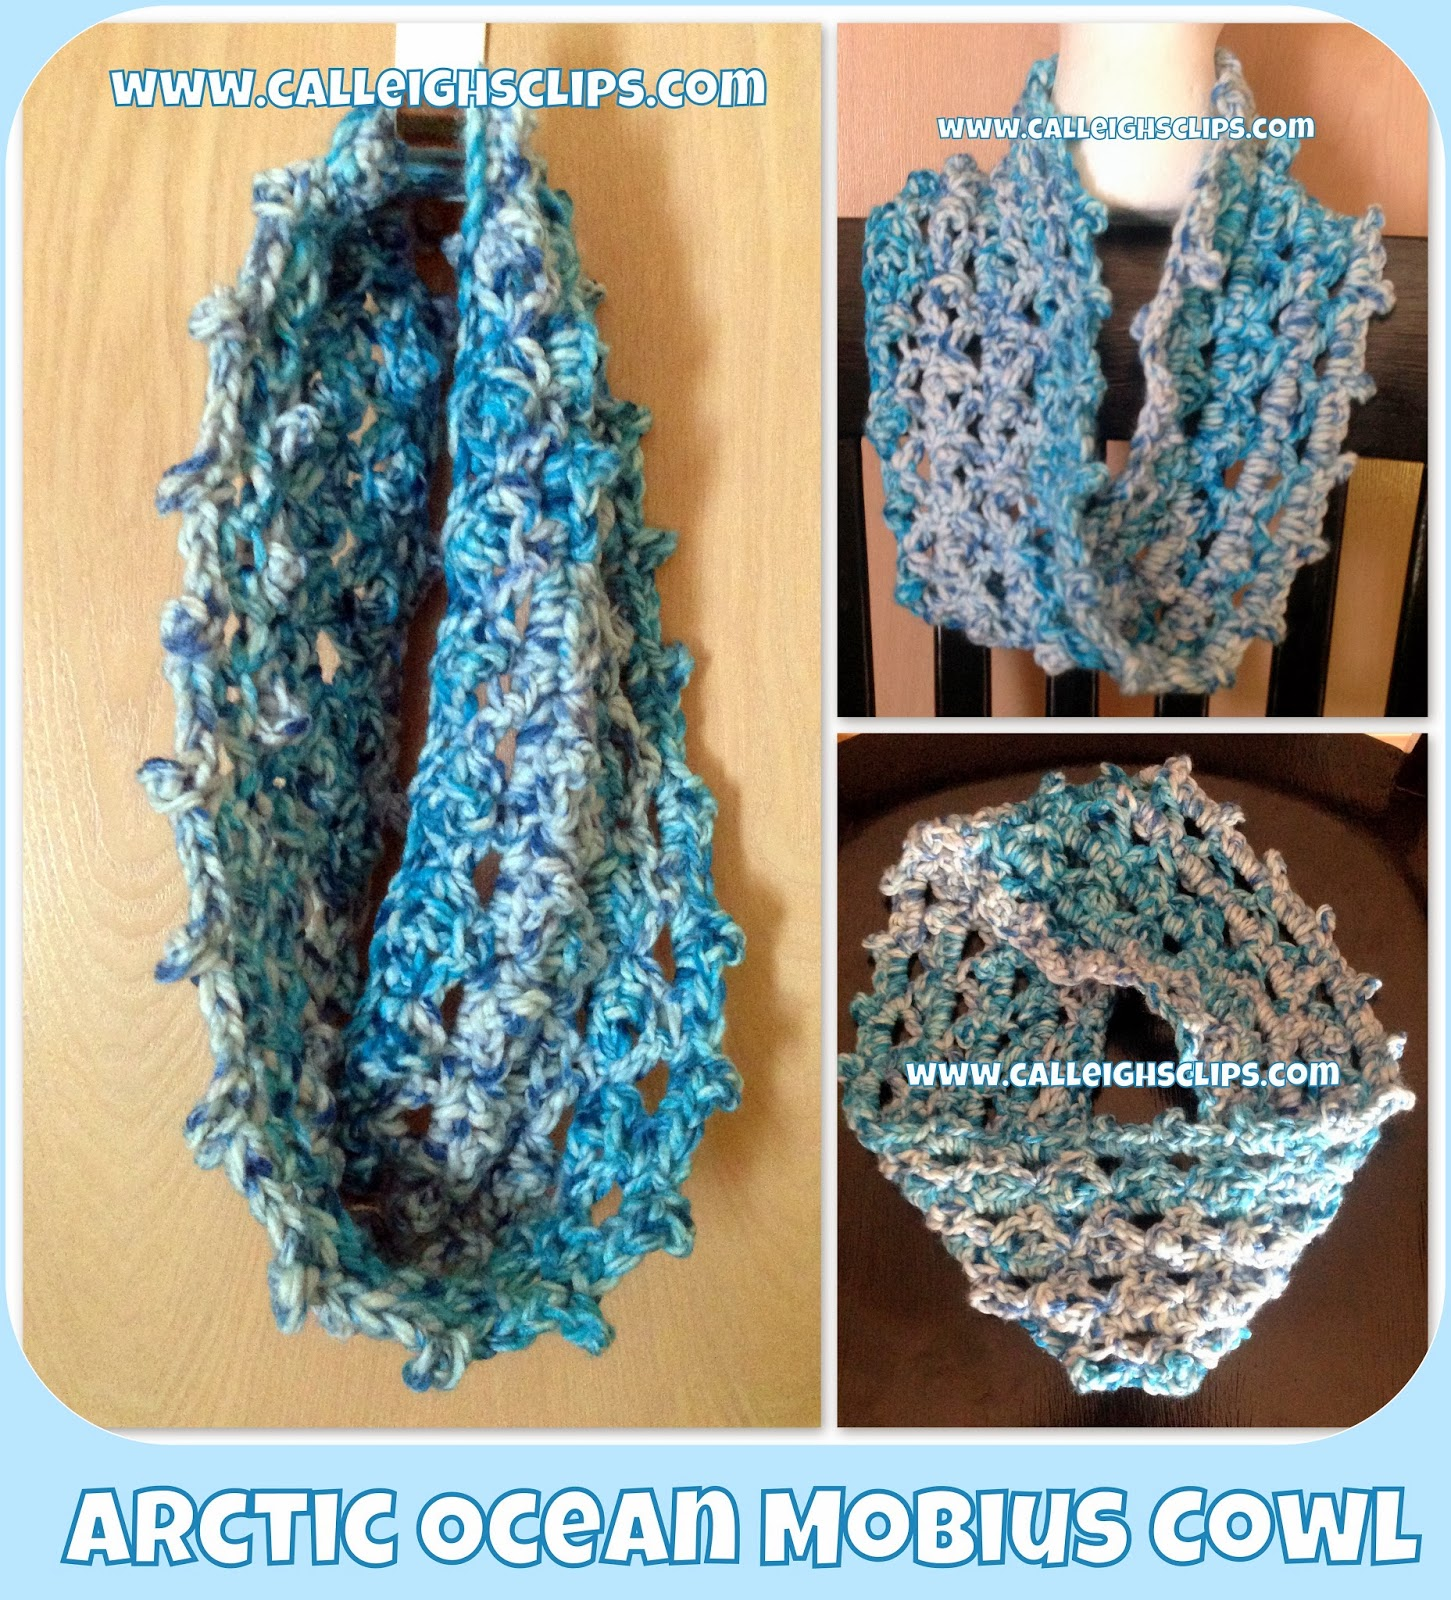 Calleigh\'s Clips & Crochet Creations: Arctic Ocean Mobius Cowl ...